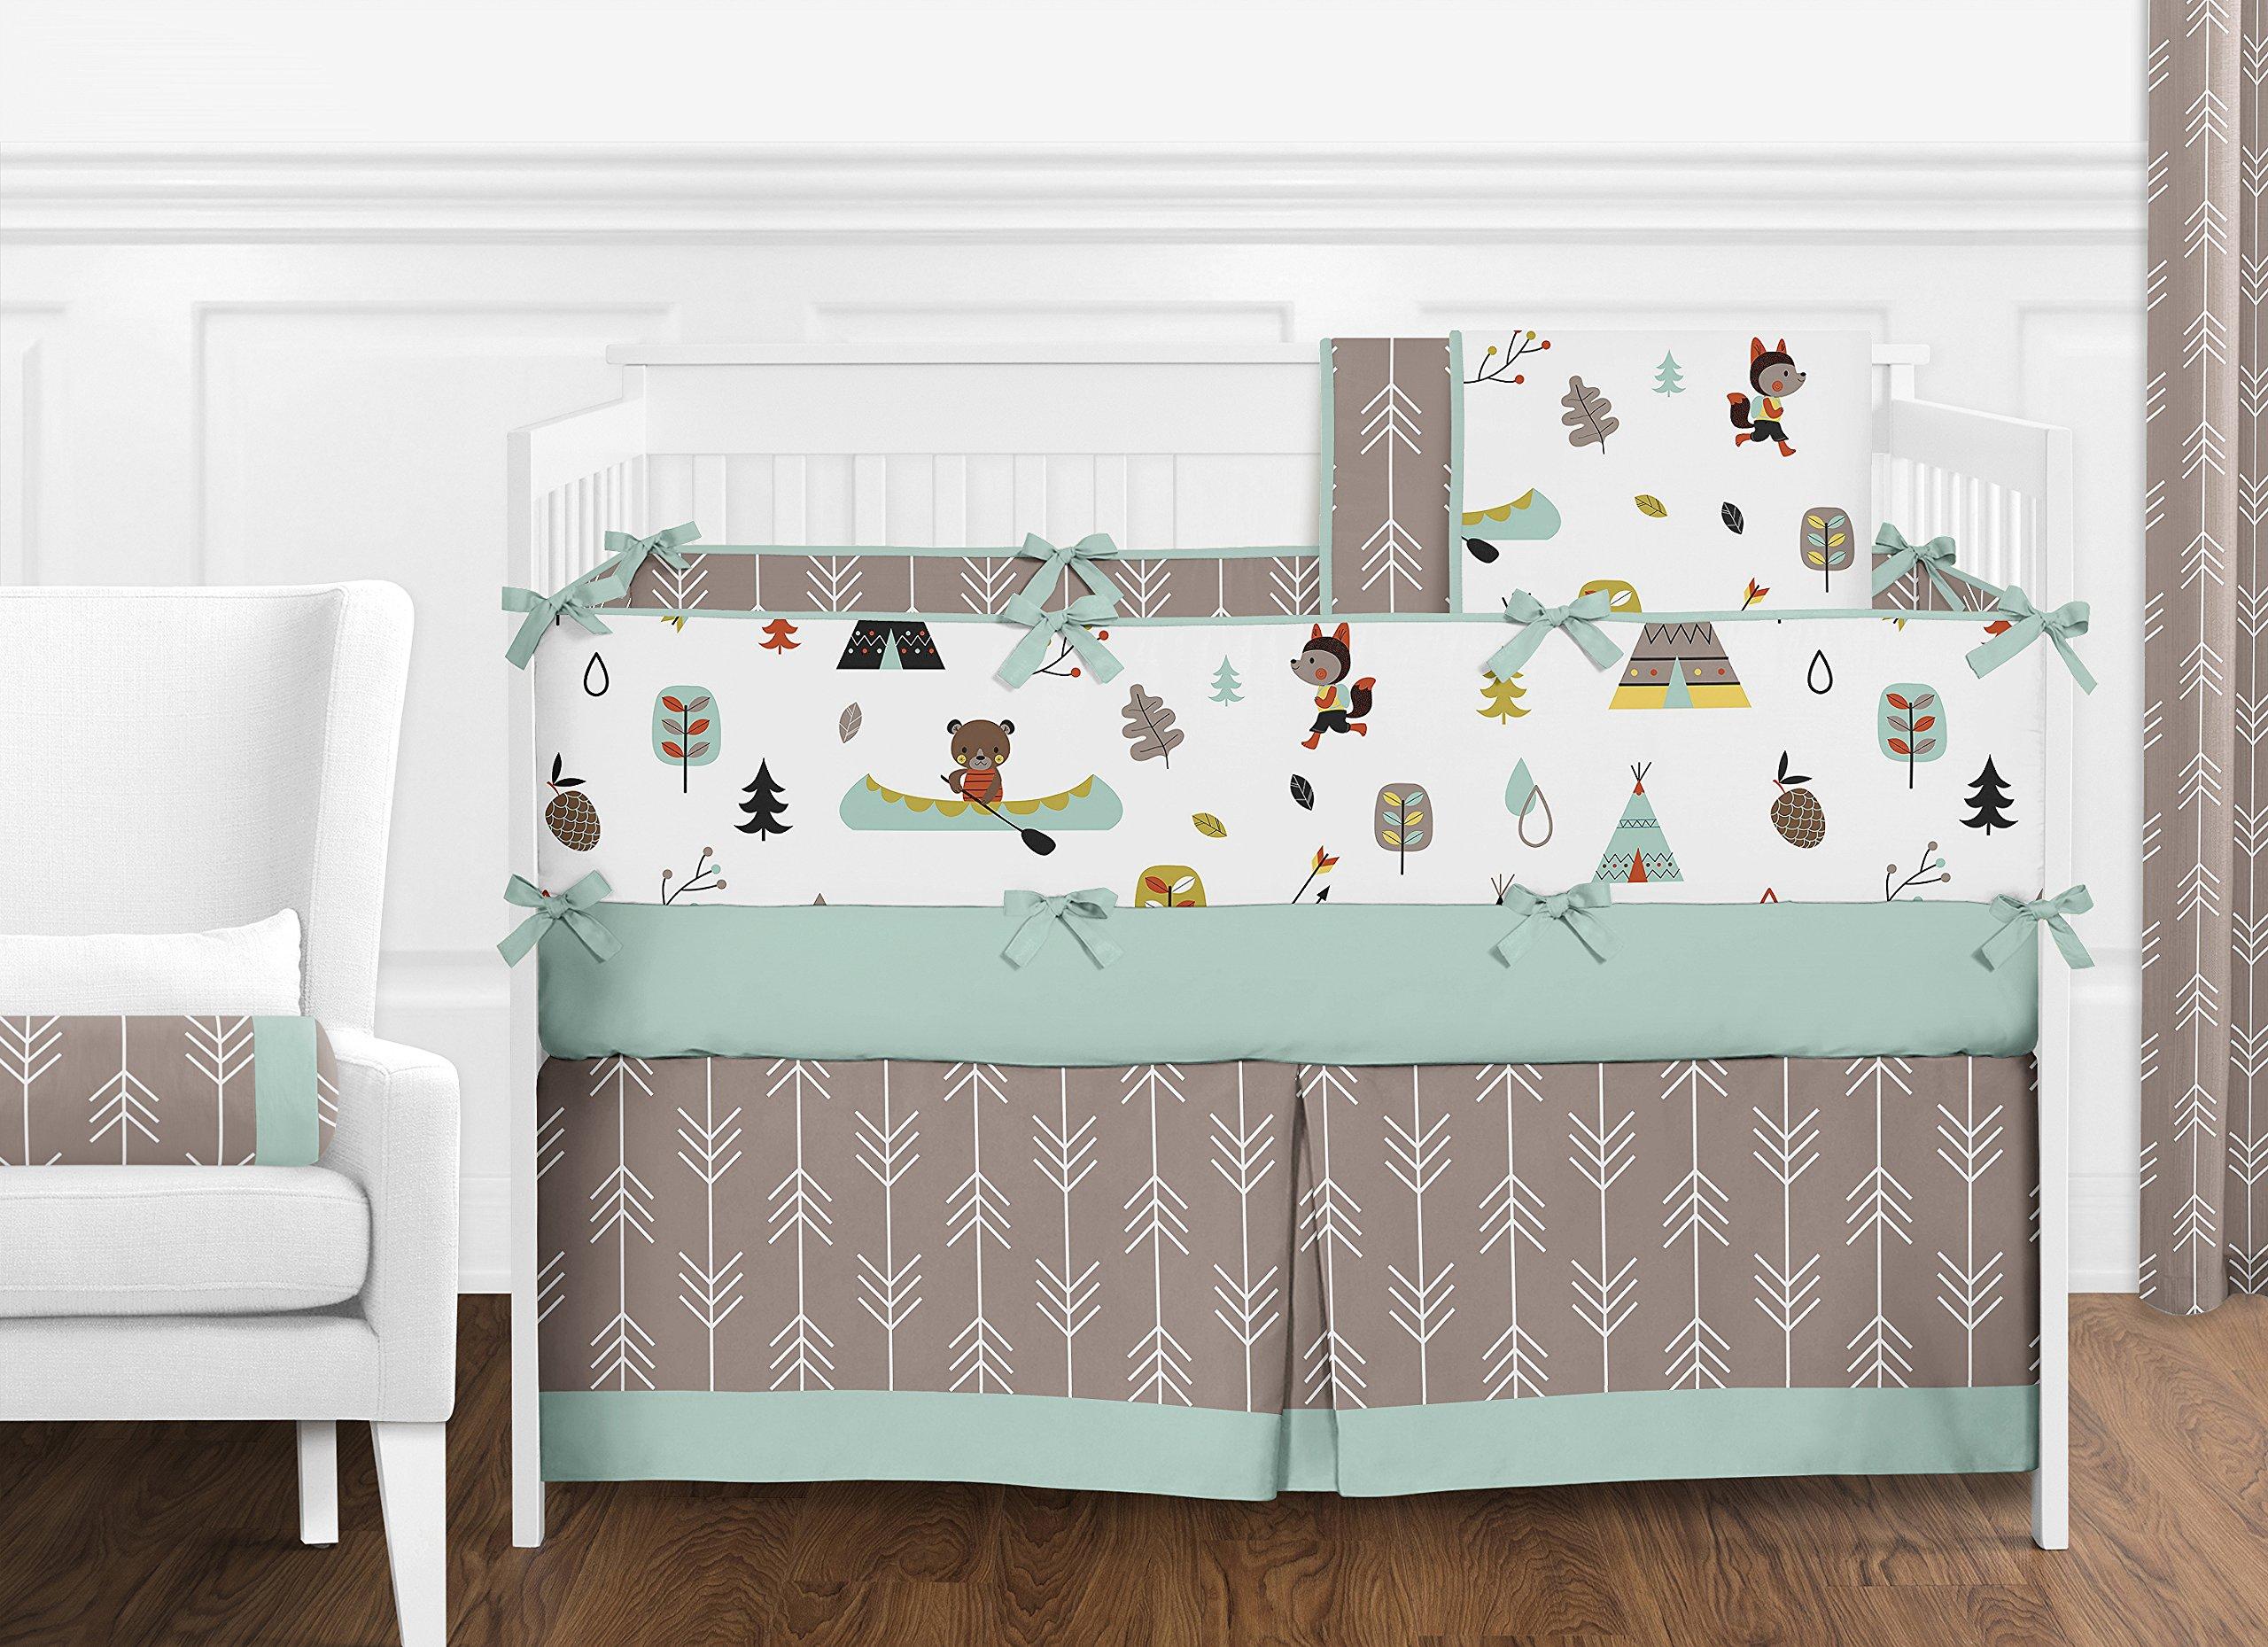 Sweet Jojo Designs Aqua Blue and Gray Outdoor Adventure Teepee Baby, Childrens Lamp Shade by Sweet Jojo Designs